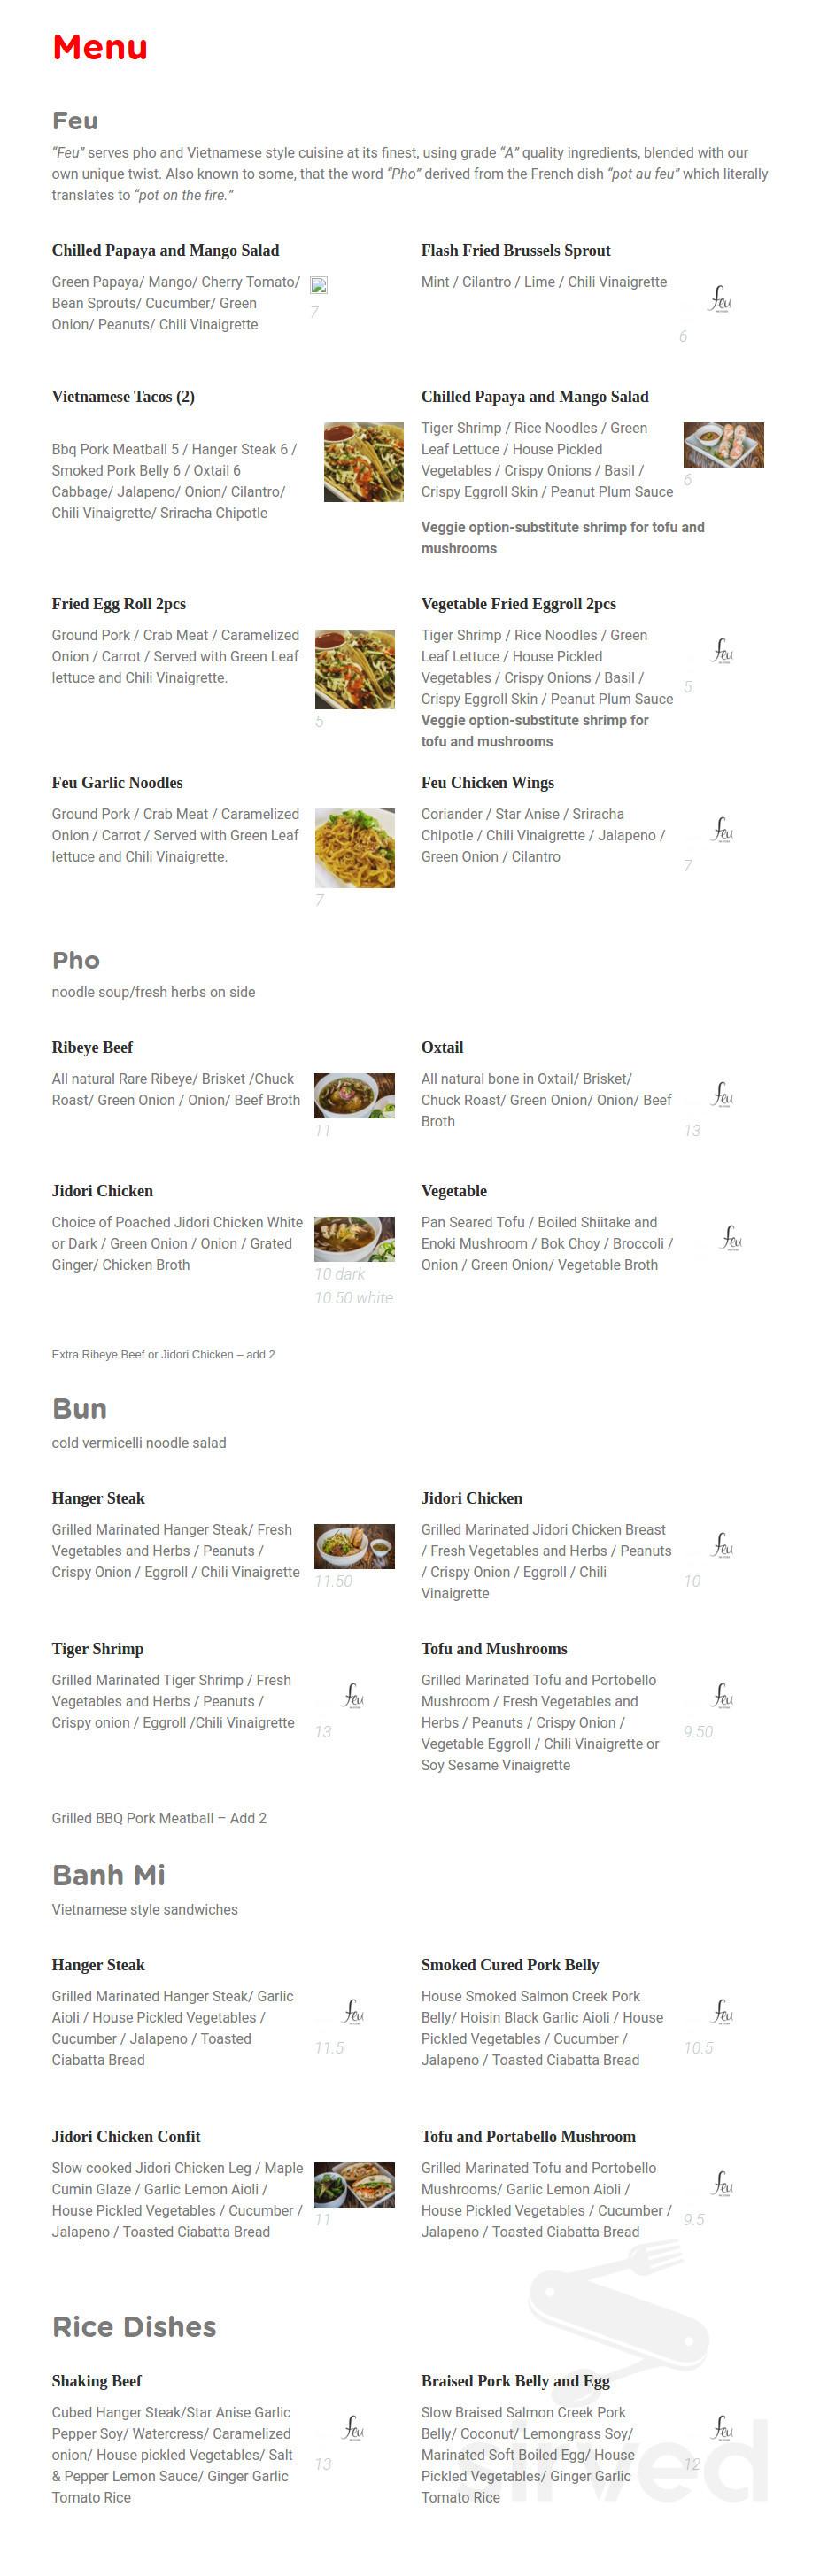 Menu For Feu Pho Kitchen In Studio City California Usa